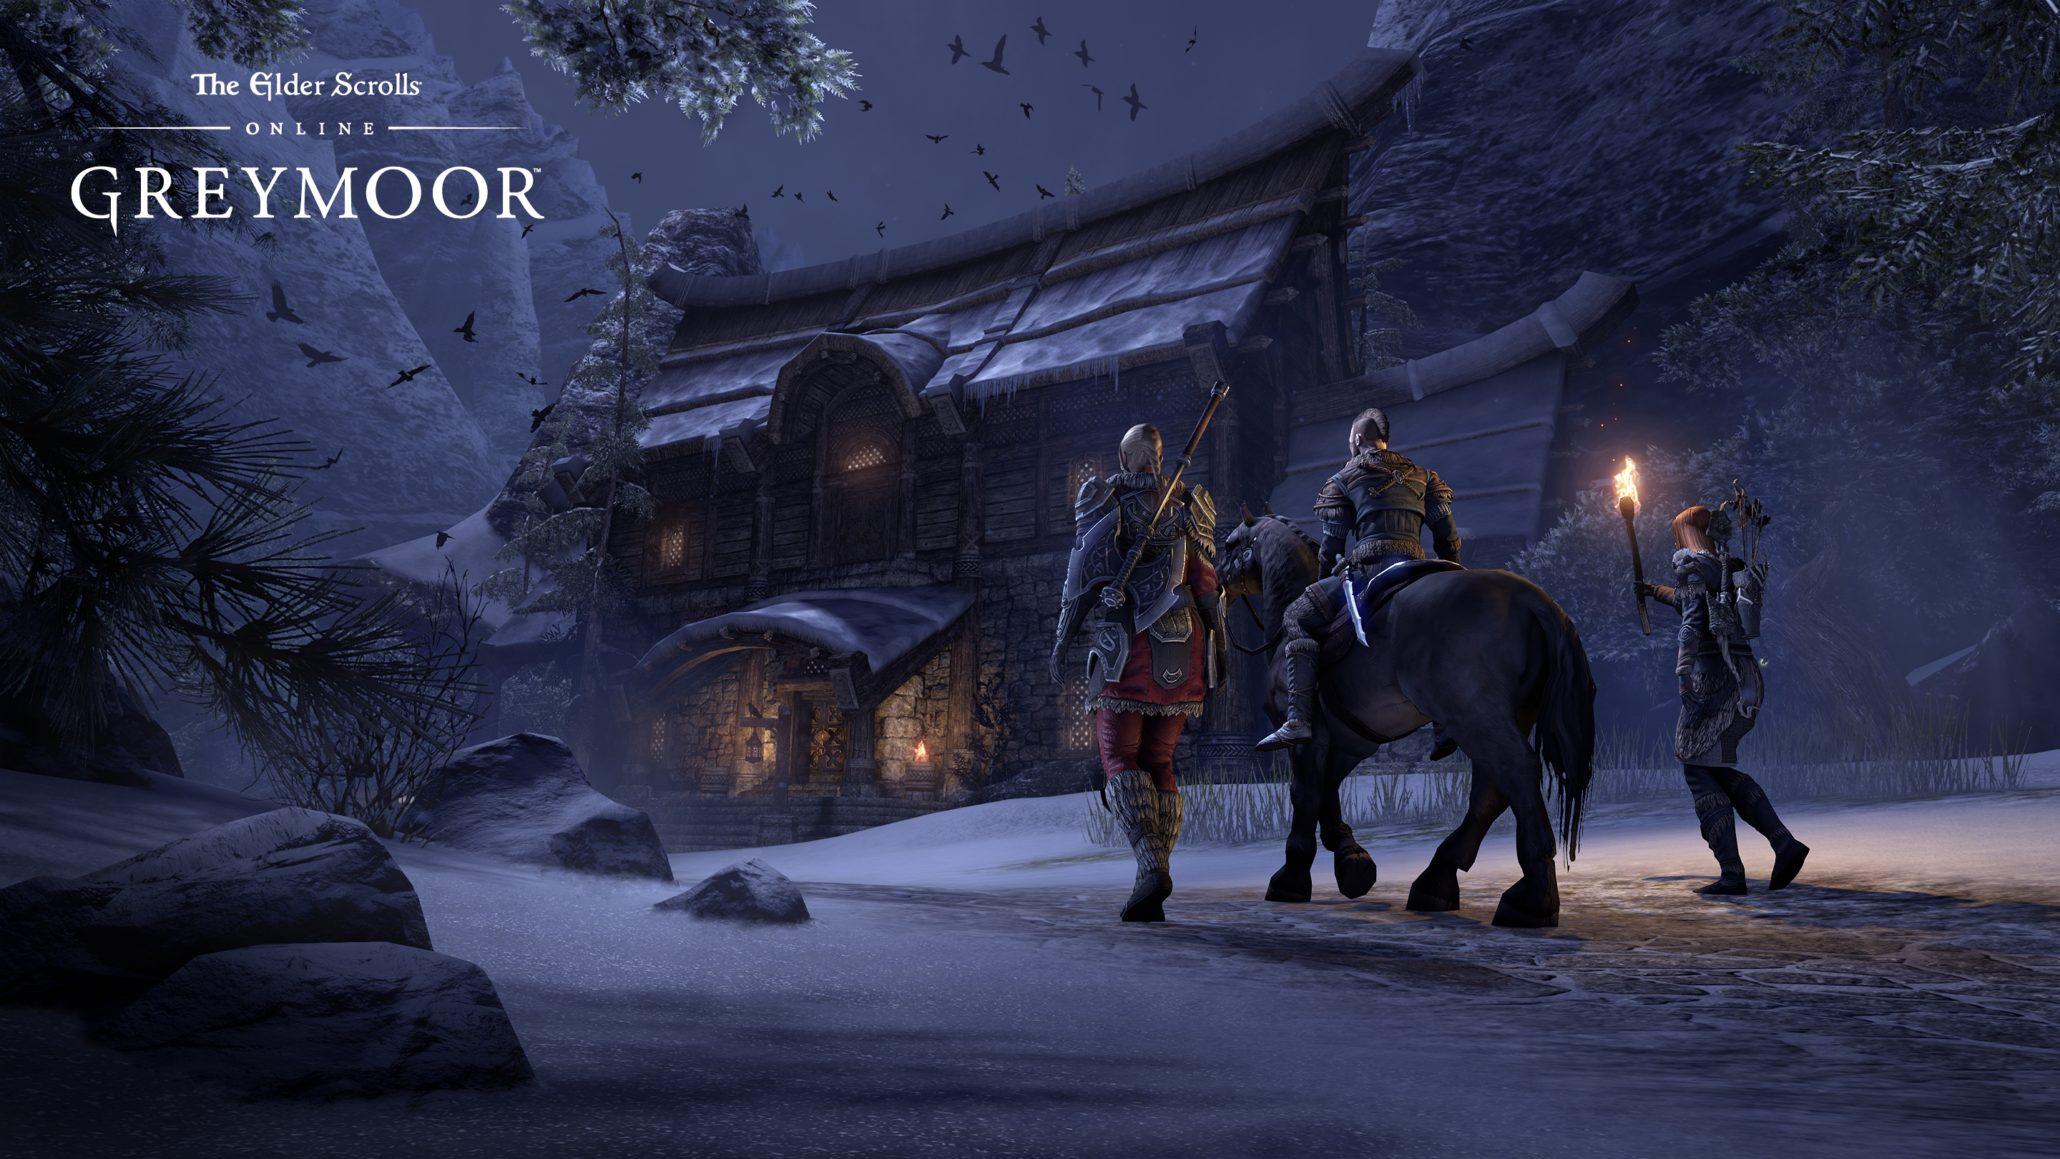 The Elder Scrolls Online: Greymoor, czyli kolejny dodatek do znanego MMORPG